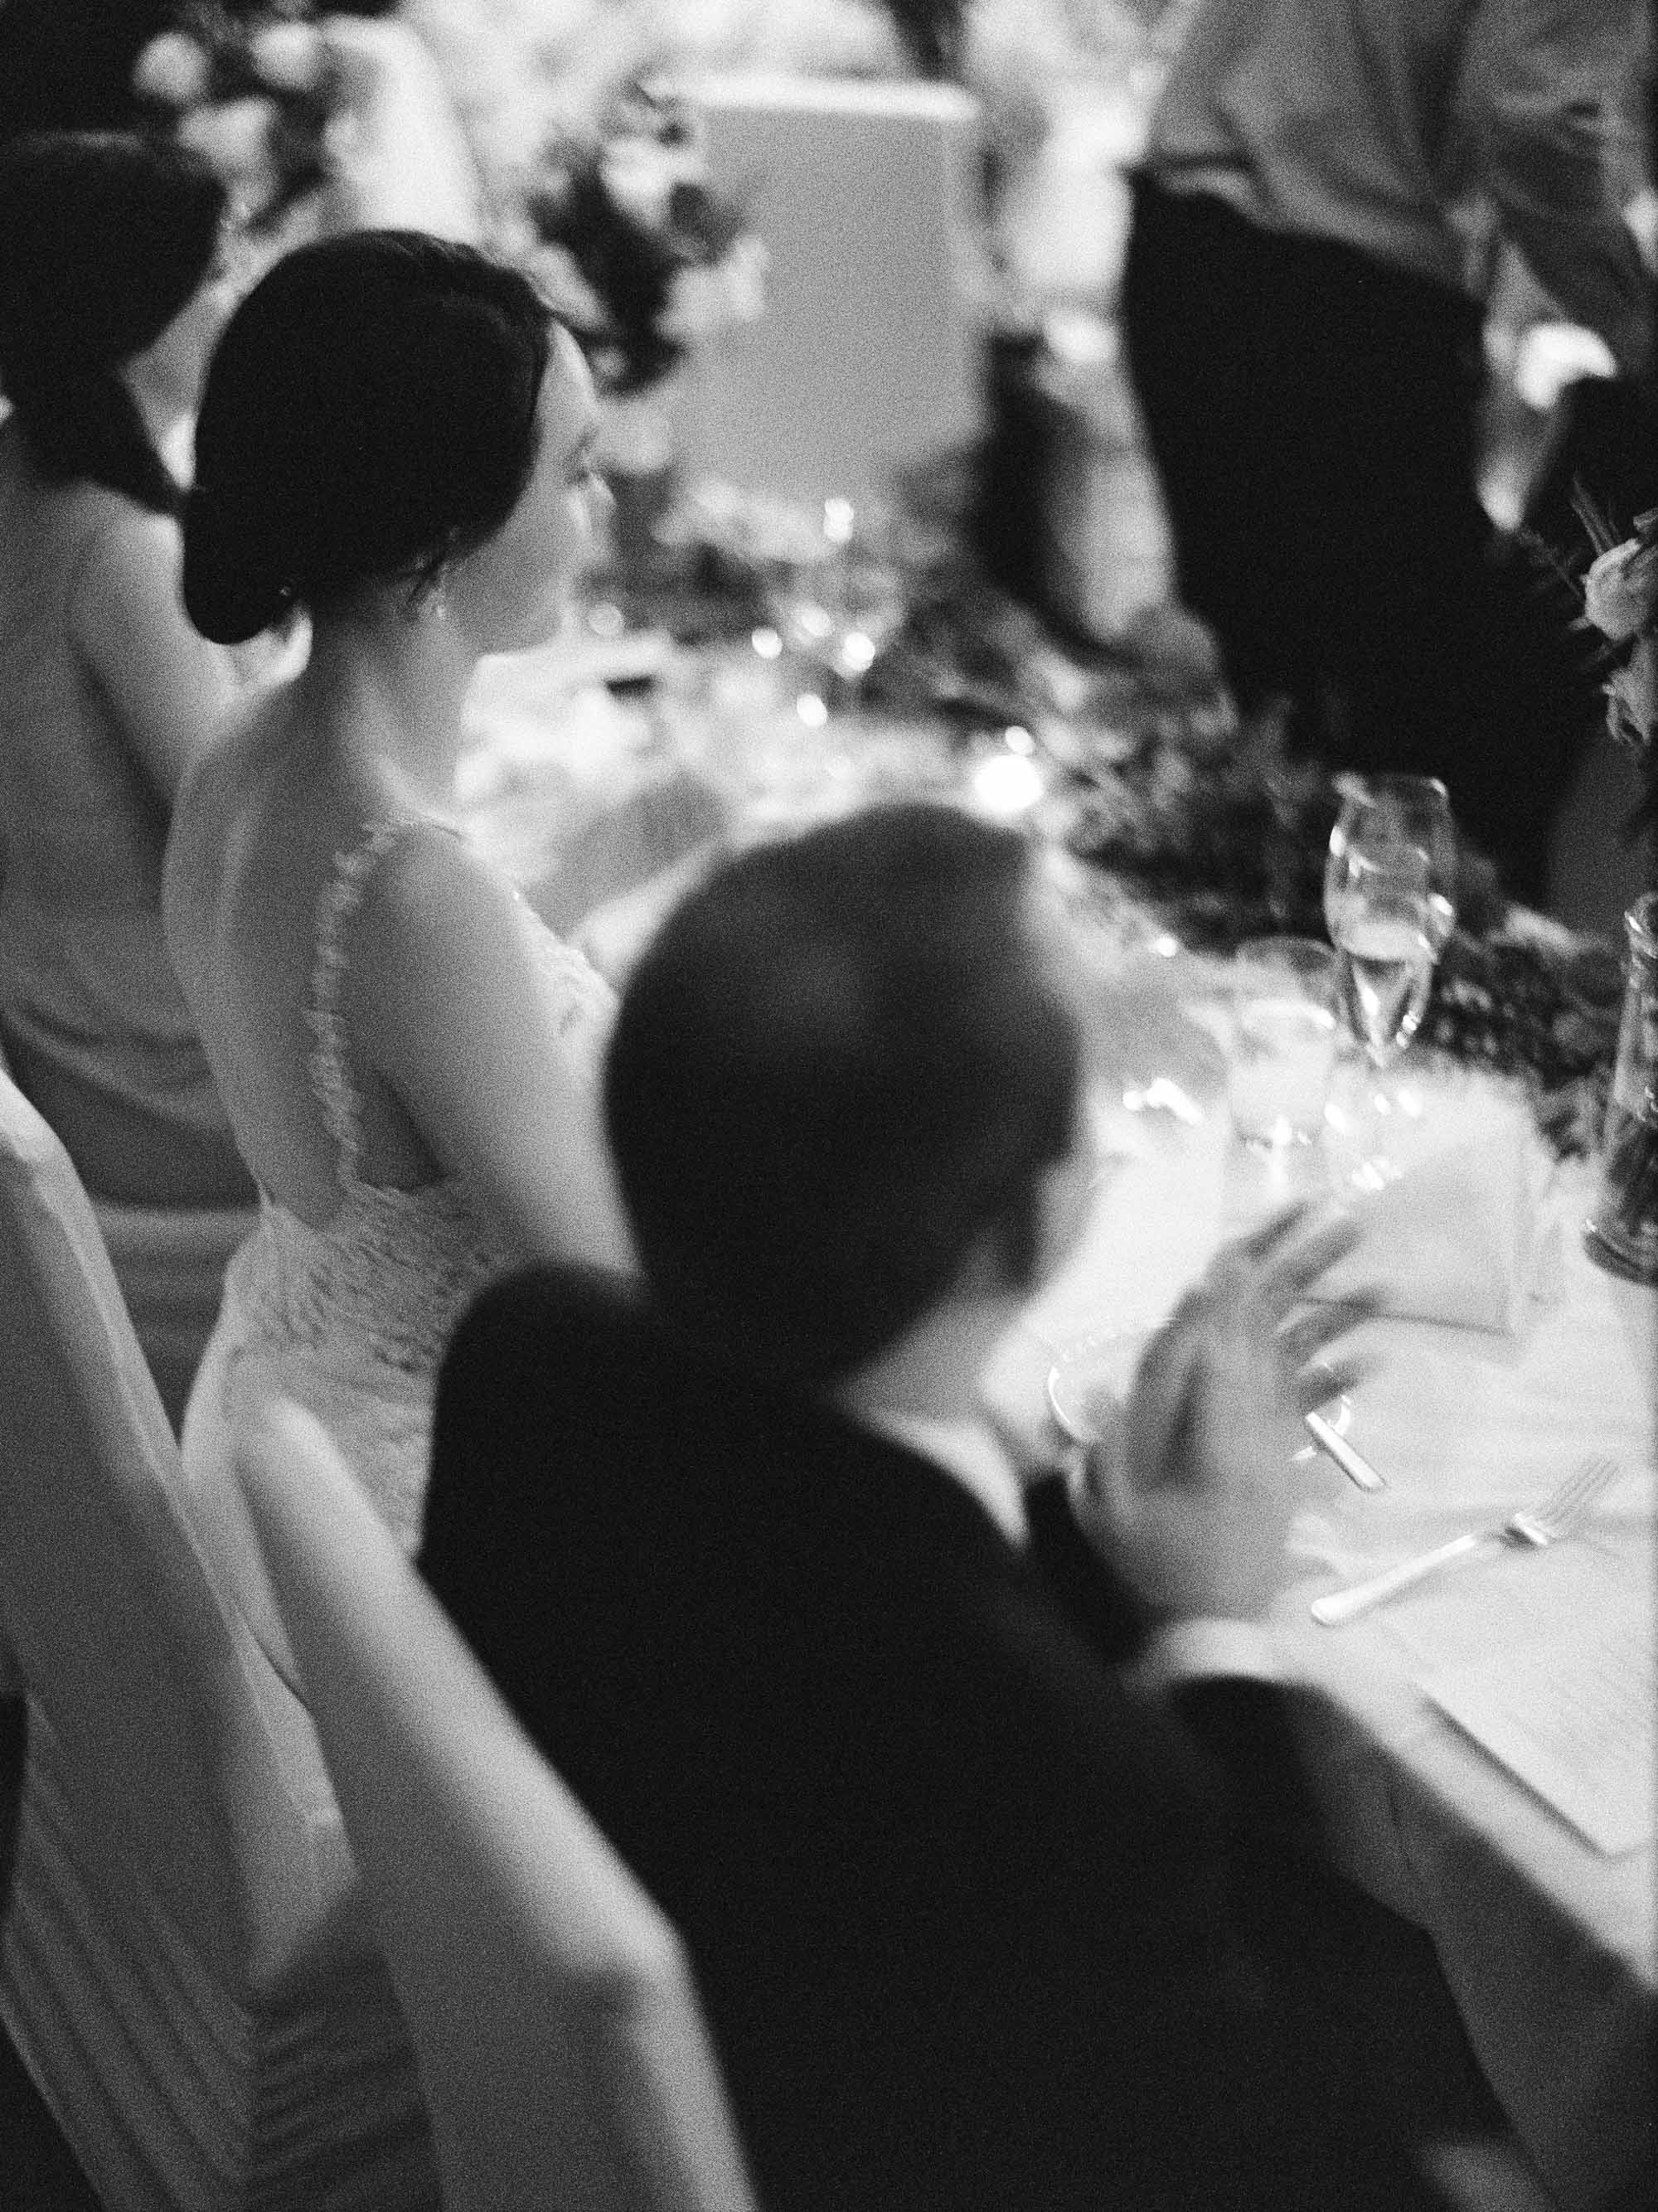 Mount-Lofty-House-wedding-photography-094.jpg